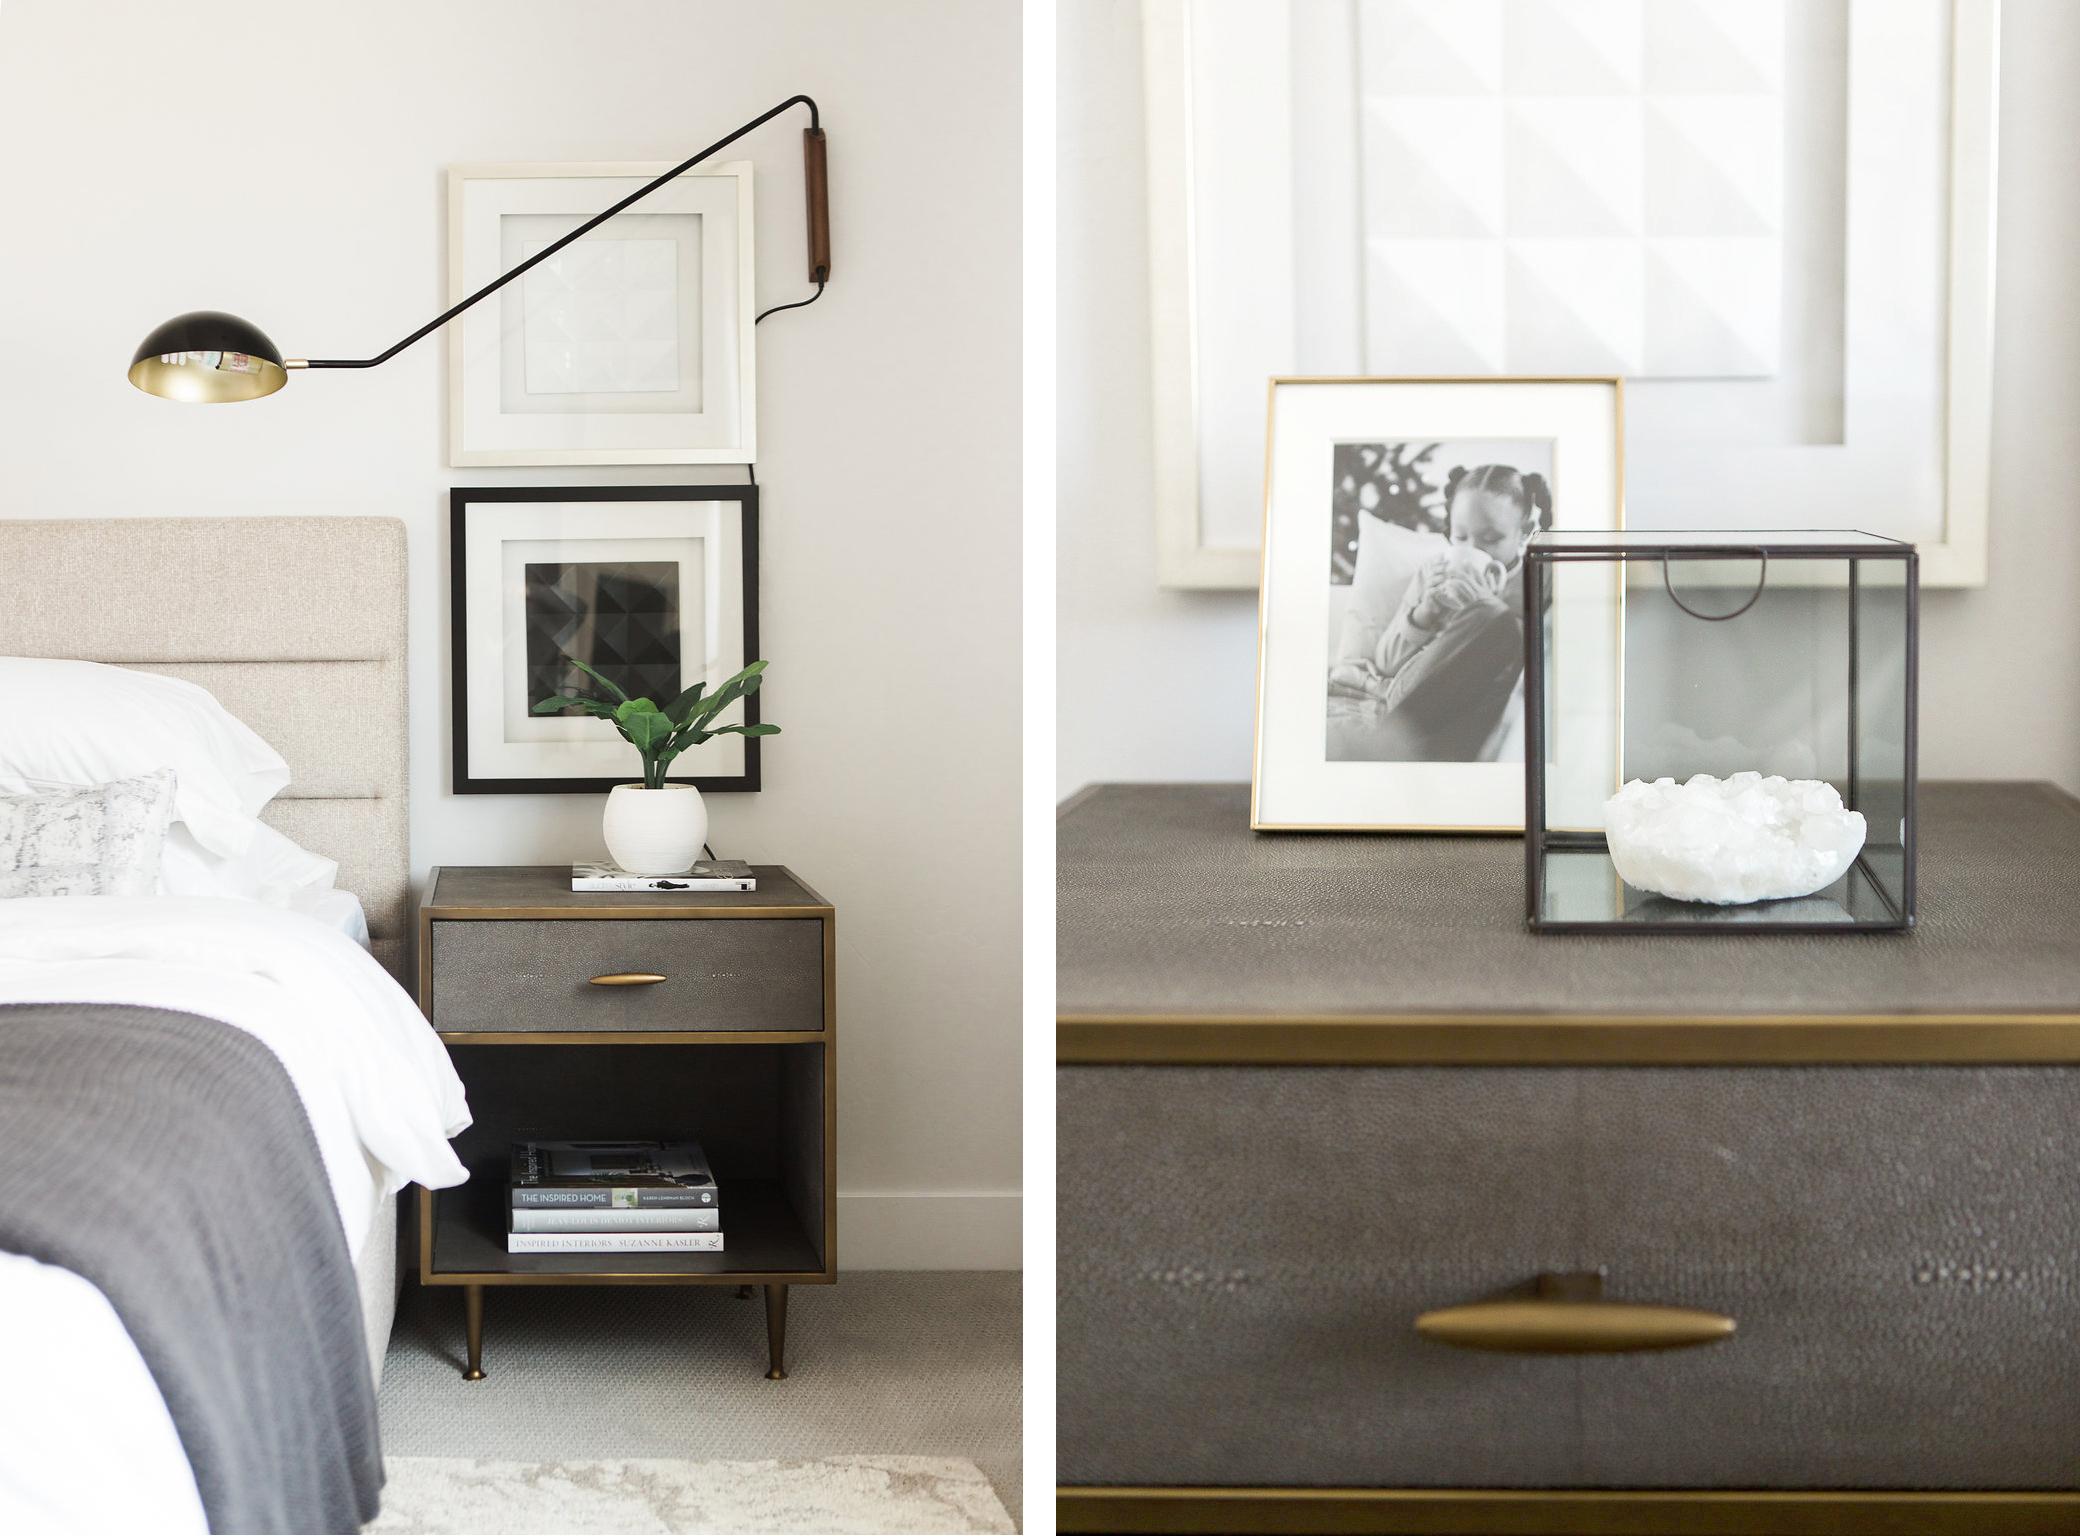 Minimal Modern Bedroom Design Details | Akin Design Studio